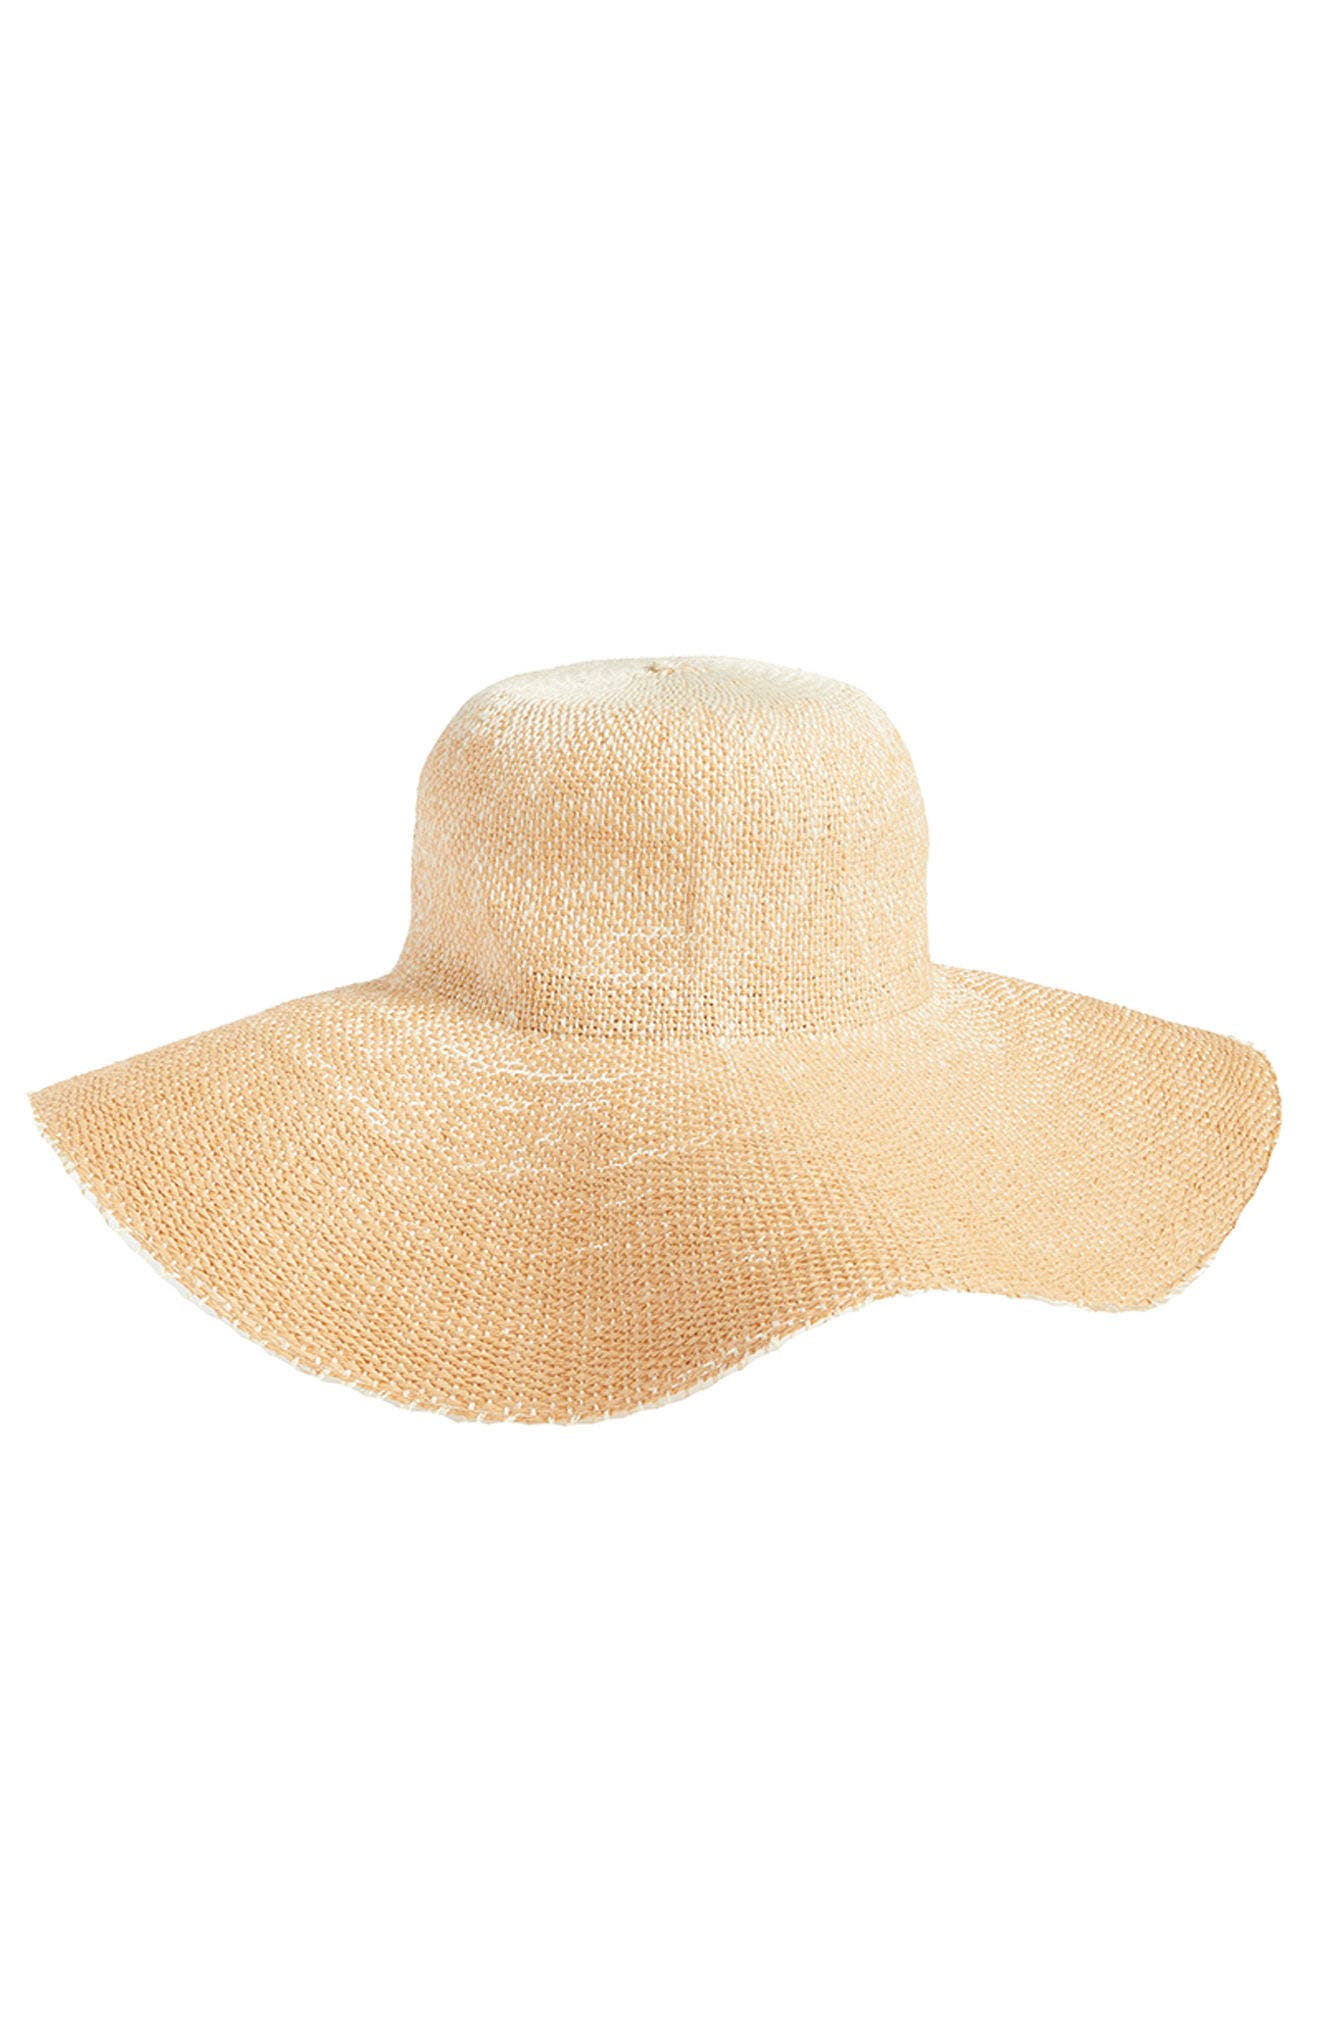 Fringe Ombré Floppy Straw Hat,                             Alternate thumbnail 3, color,